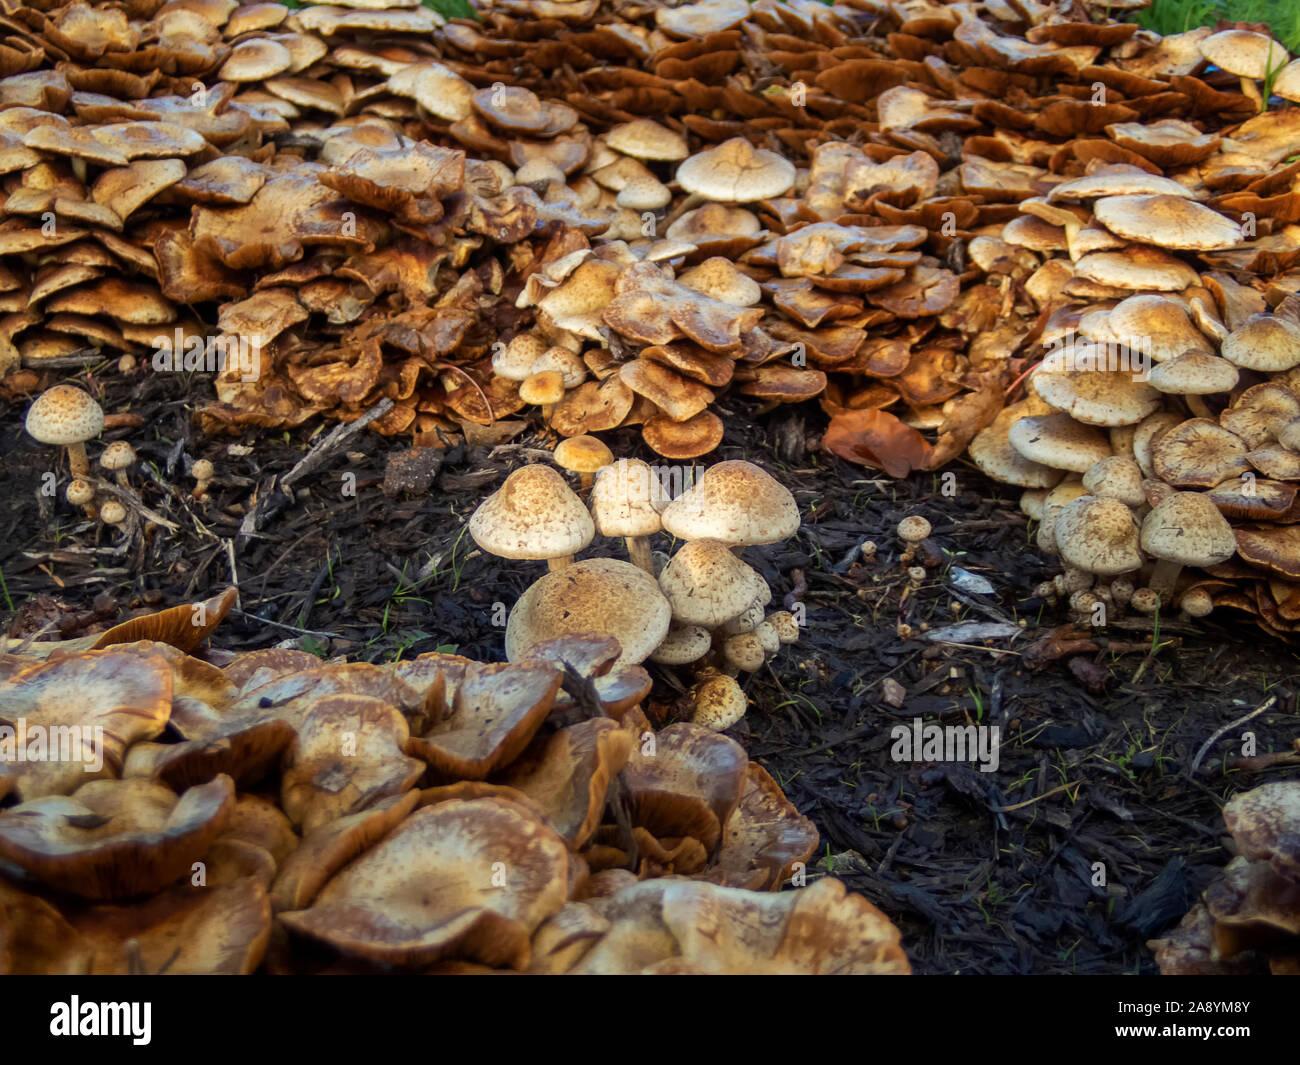 Brown Mushroom Fungus Fungi Embroidery Patch